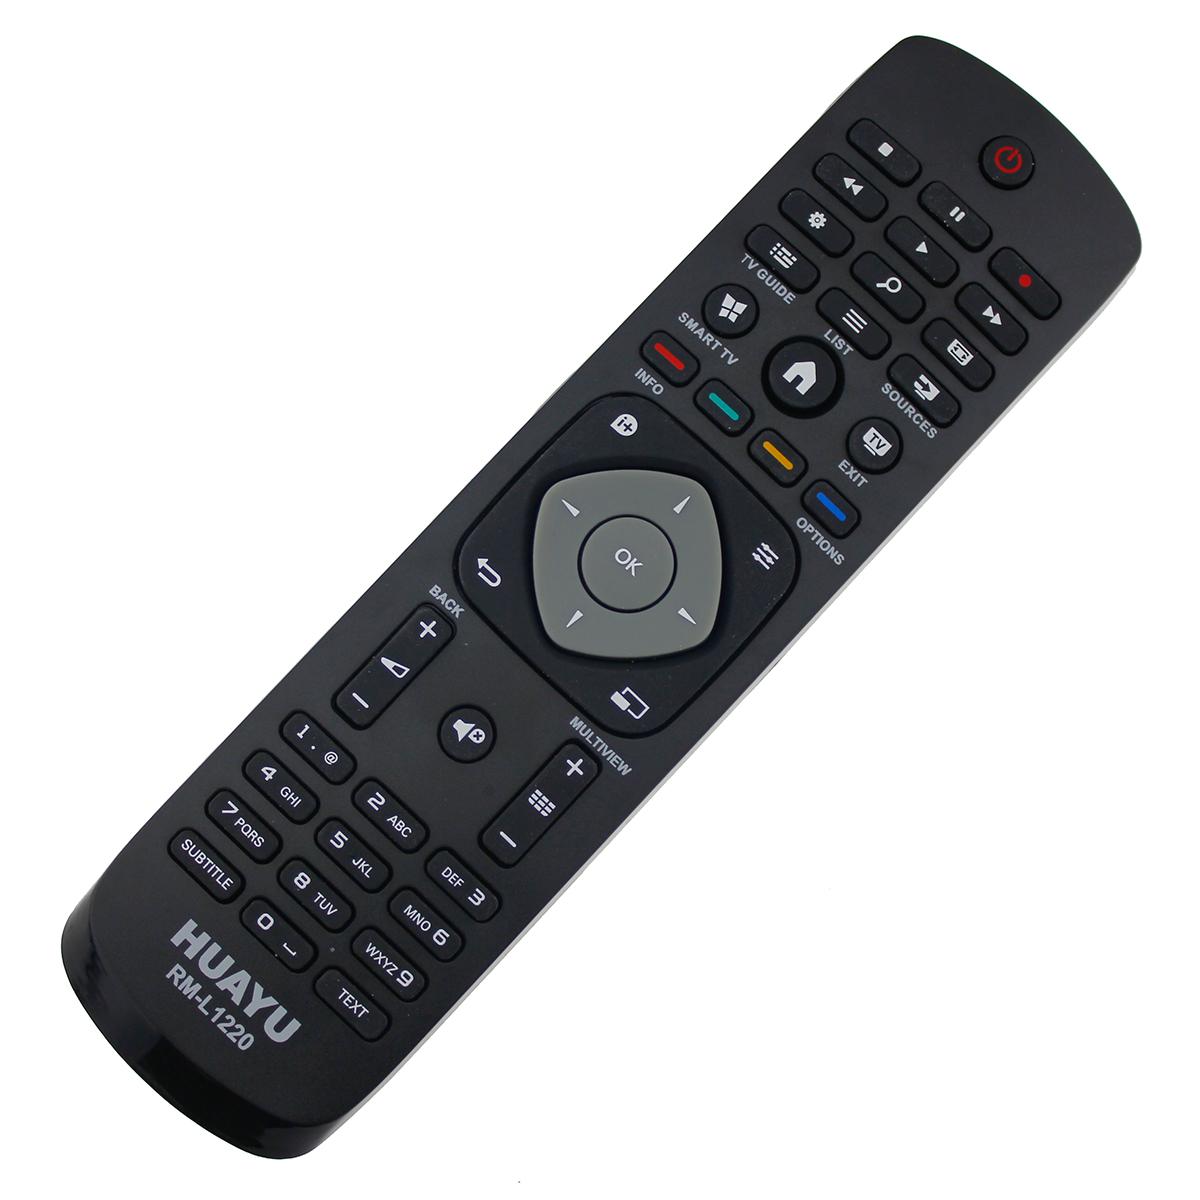 ersatz fernbedienung philips ykf354 001 996590009952 led 3d tv remote ebay. Black Bedroom Furniture Sets. Home Design Ideas